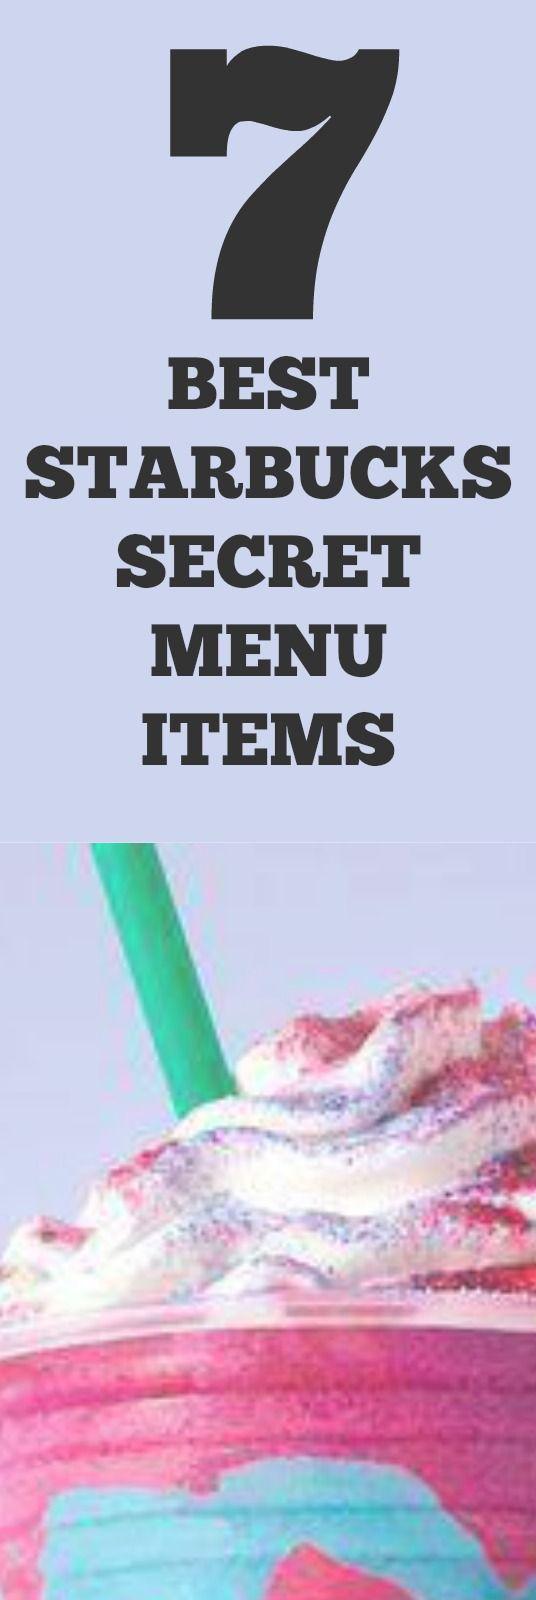 7 Best Starbucks Secret Menu Items